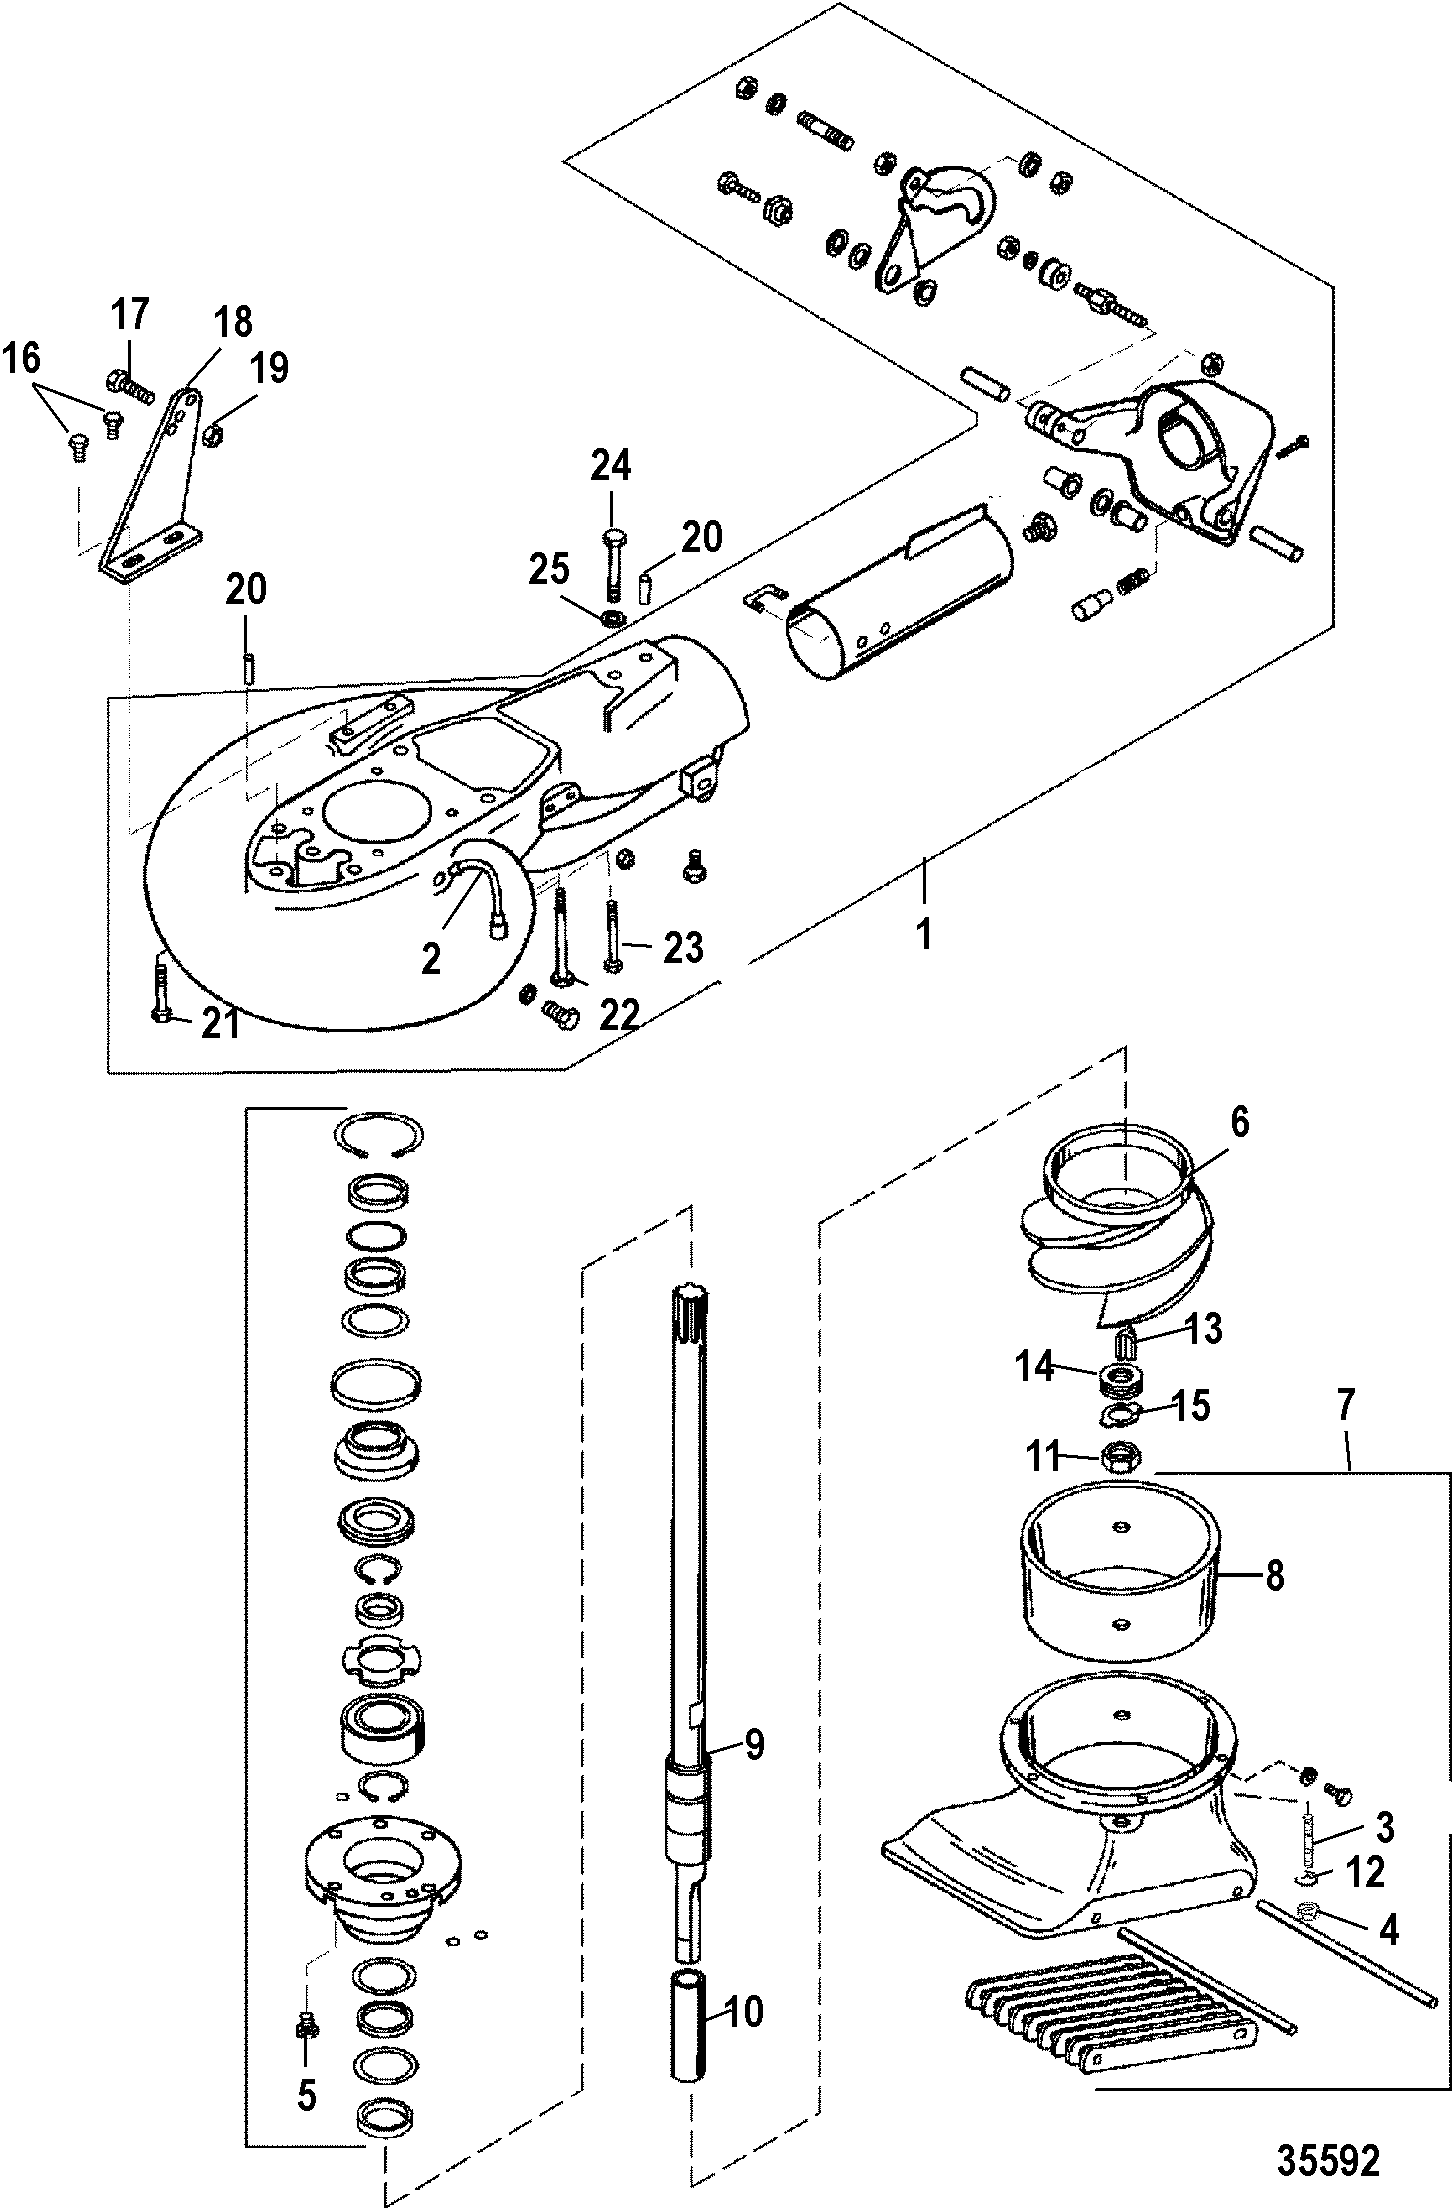 Mercury | Jet Pump Assembly - Mercury Outboard Motor Parts - Van's